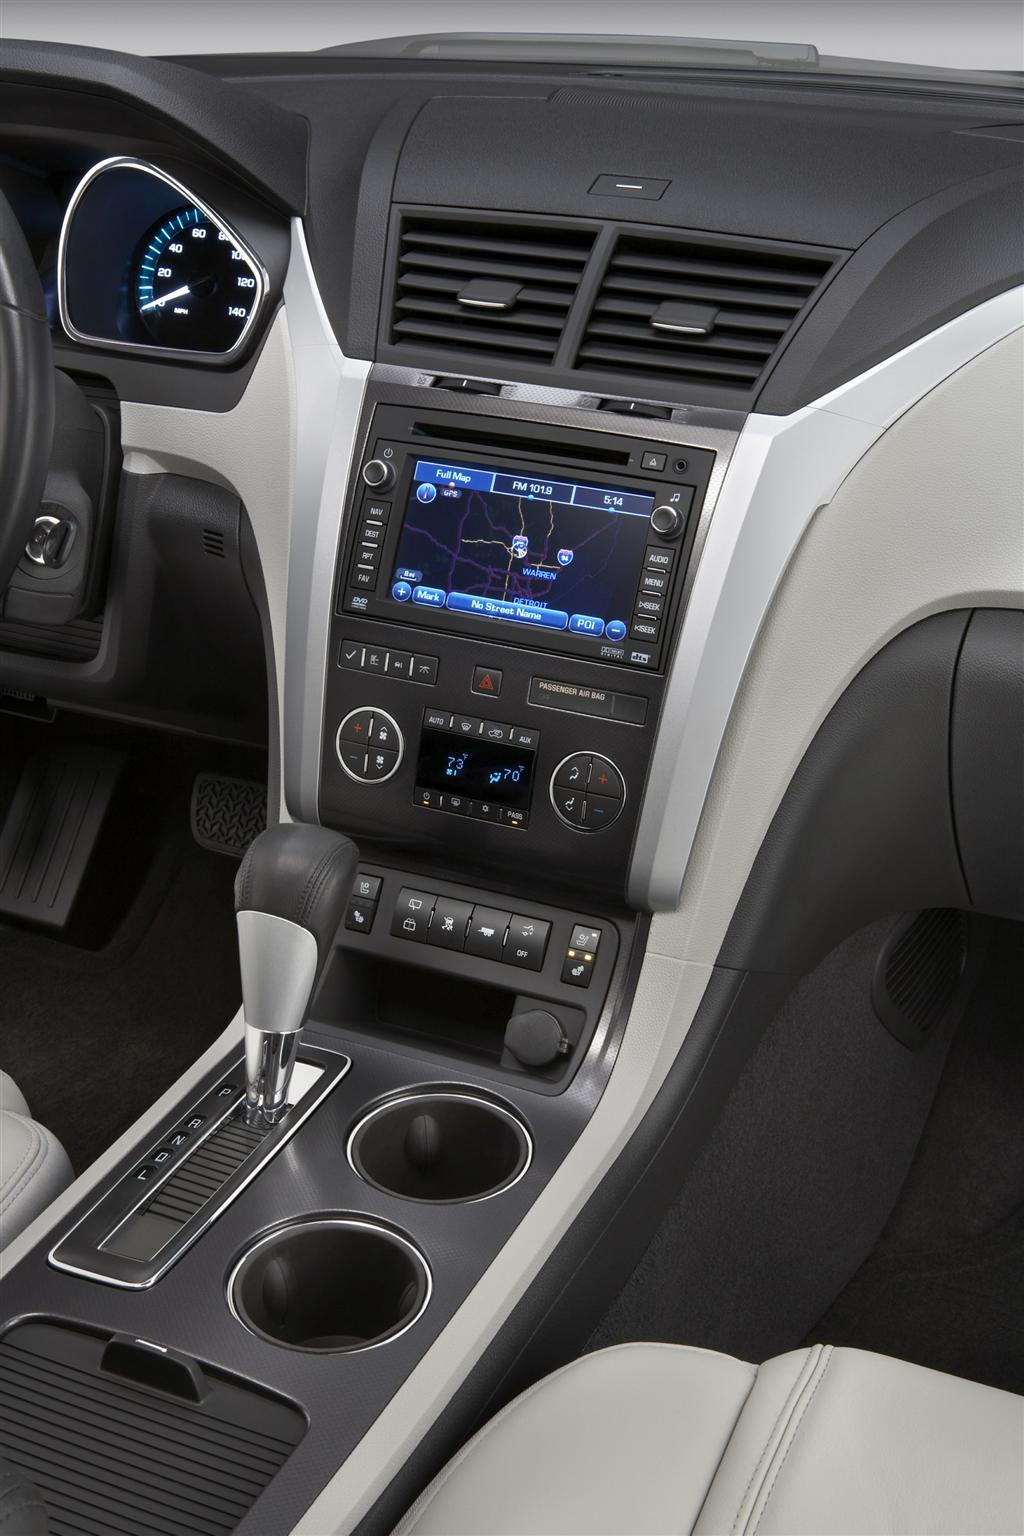 2008 Chevrolet Traverse Conceptcarz Com